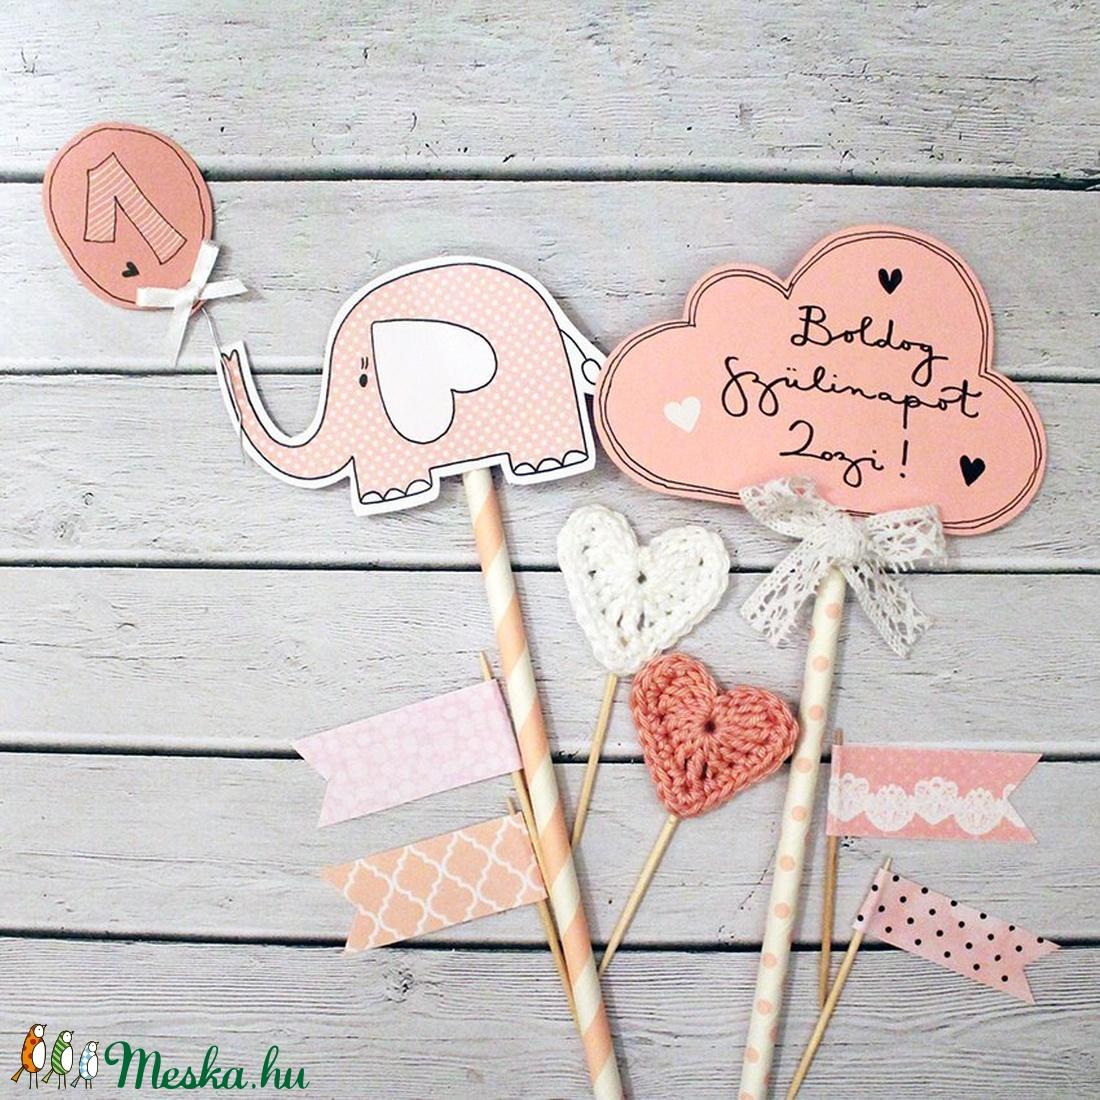 Birthday Girl MiniPakk (milady) - Meska.hu